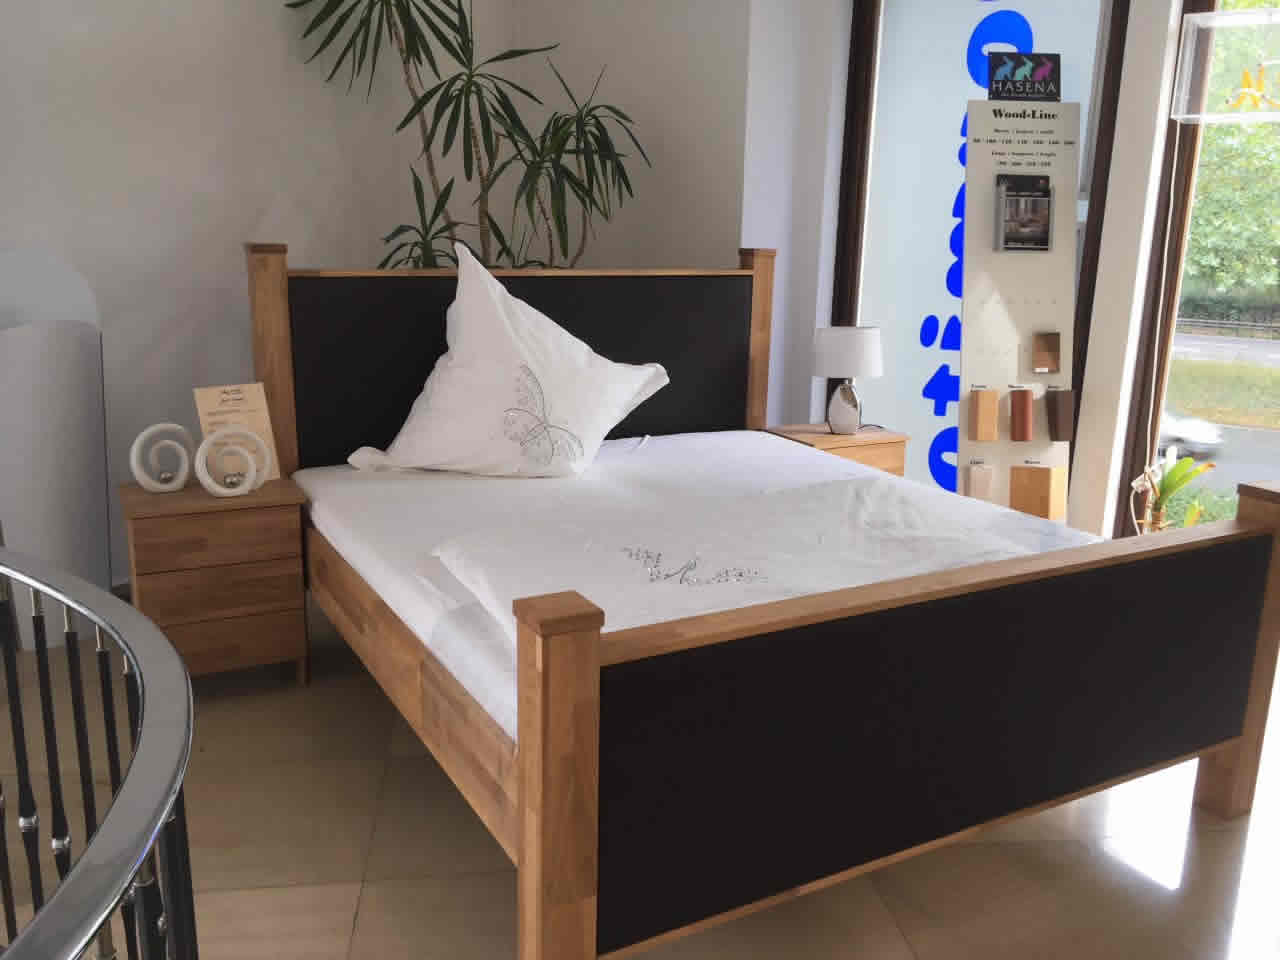 die neue federkernmatratze dormito matratzen boxspringbetten. Black Bedroom Furniture Sets. Home Design Ideas